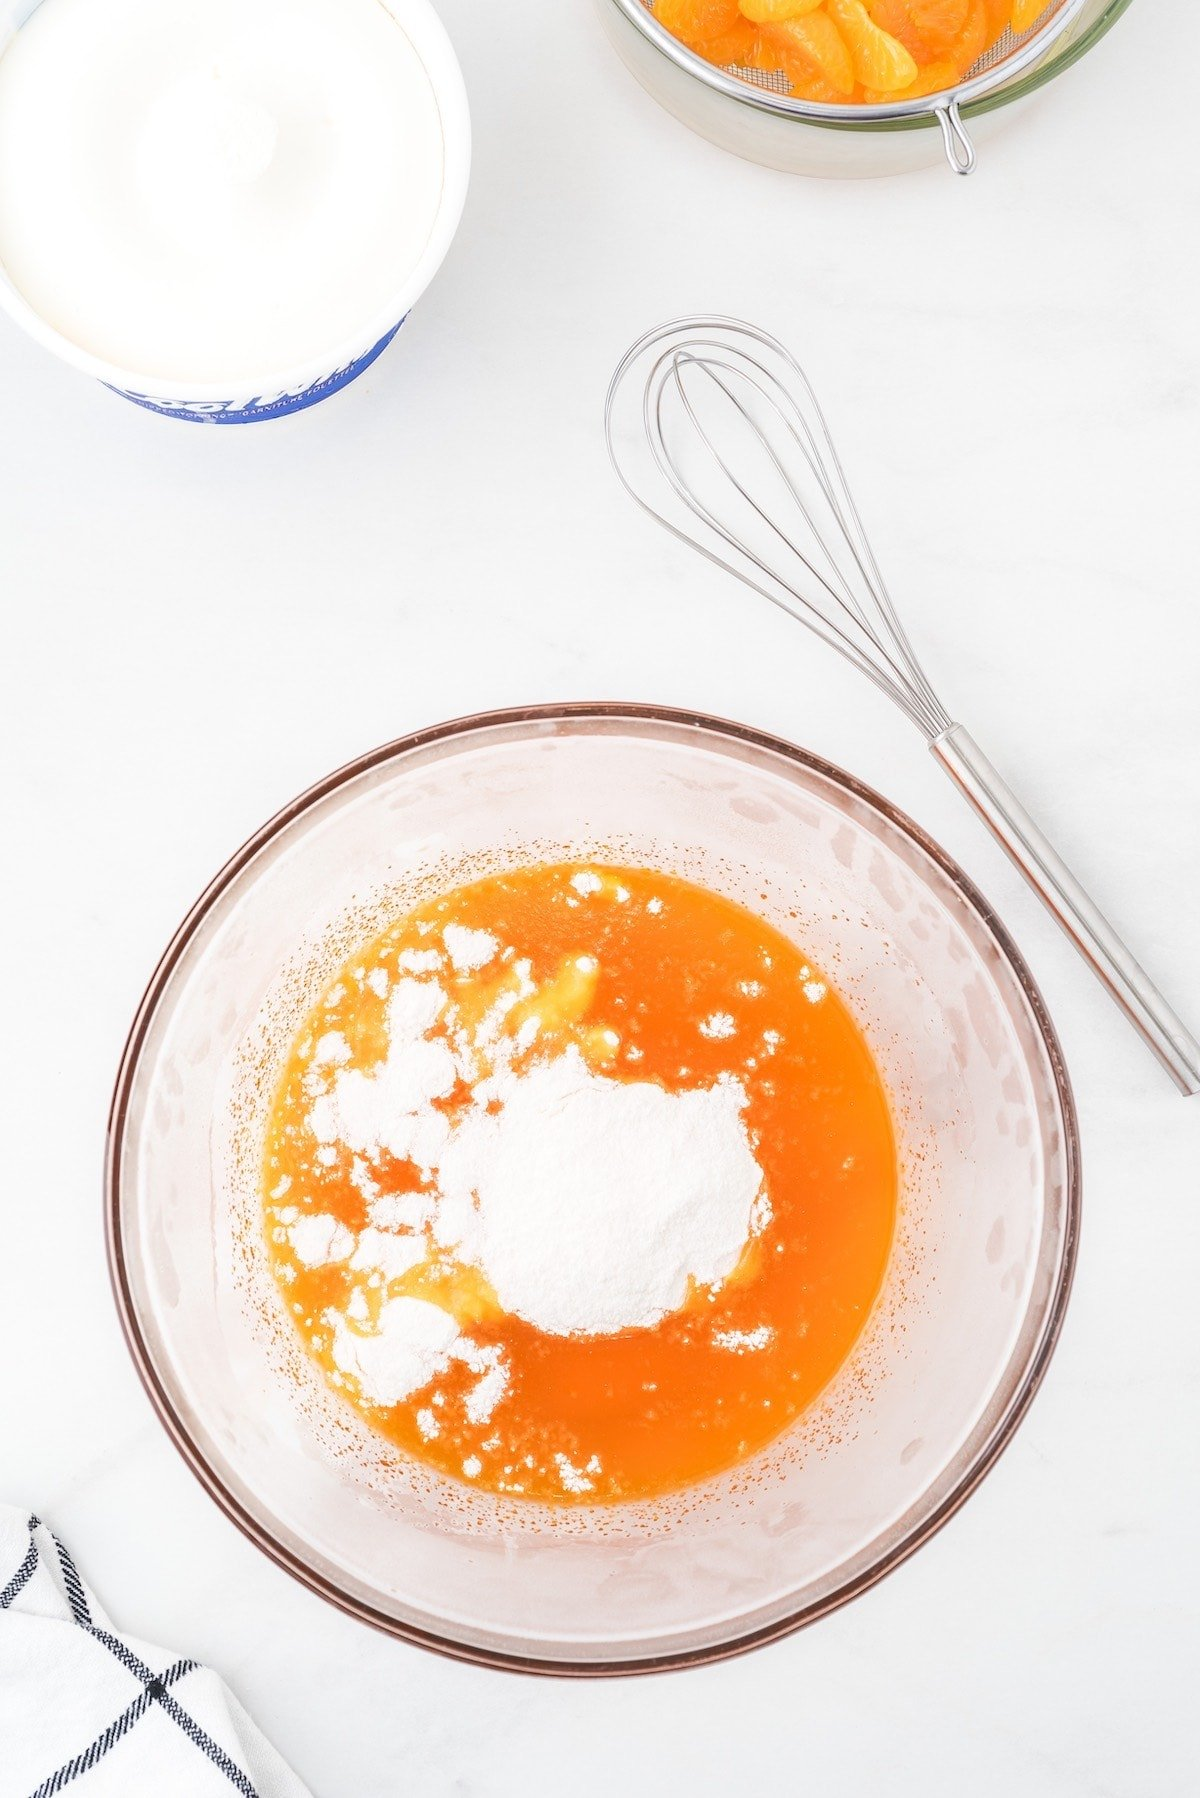 add vanilla pudding mix into the bowl